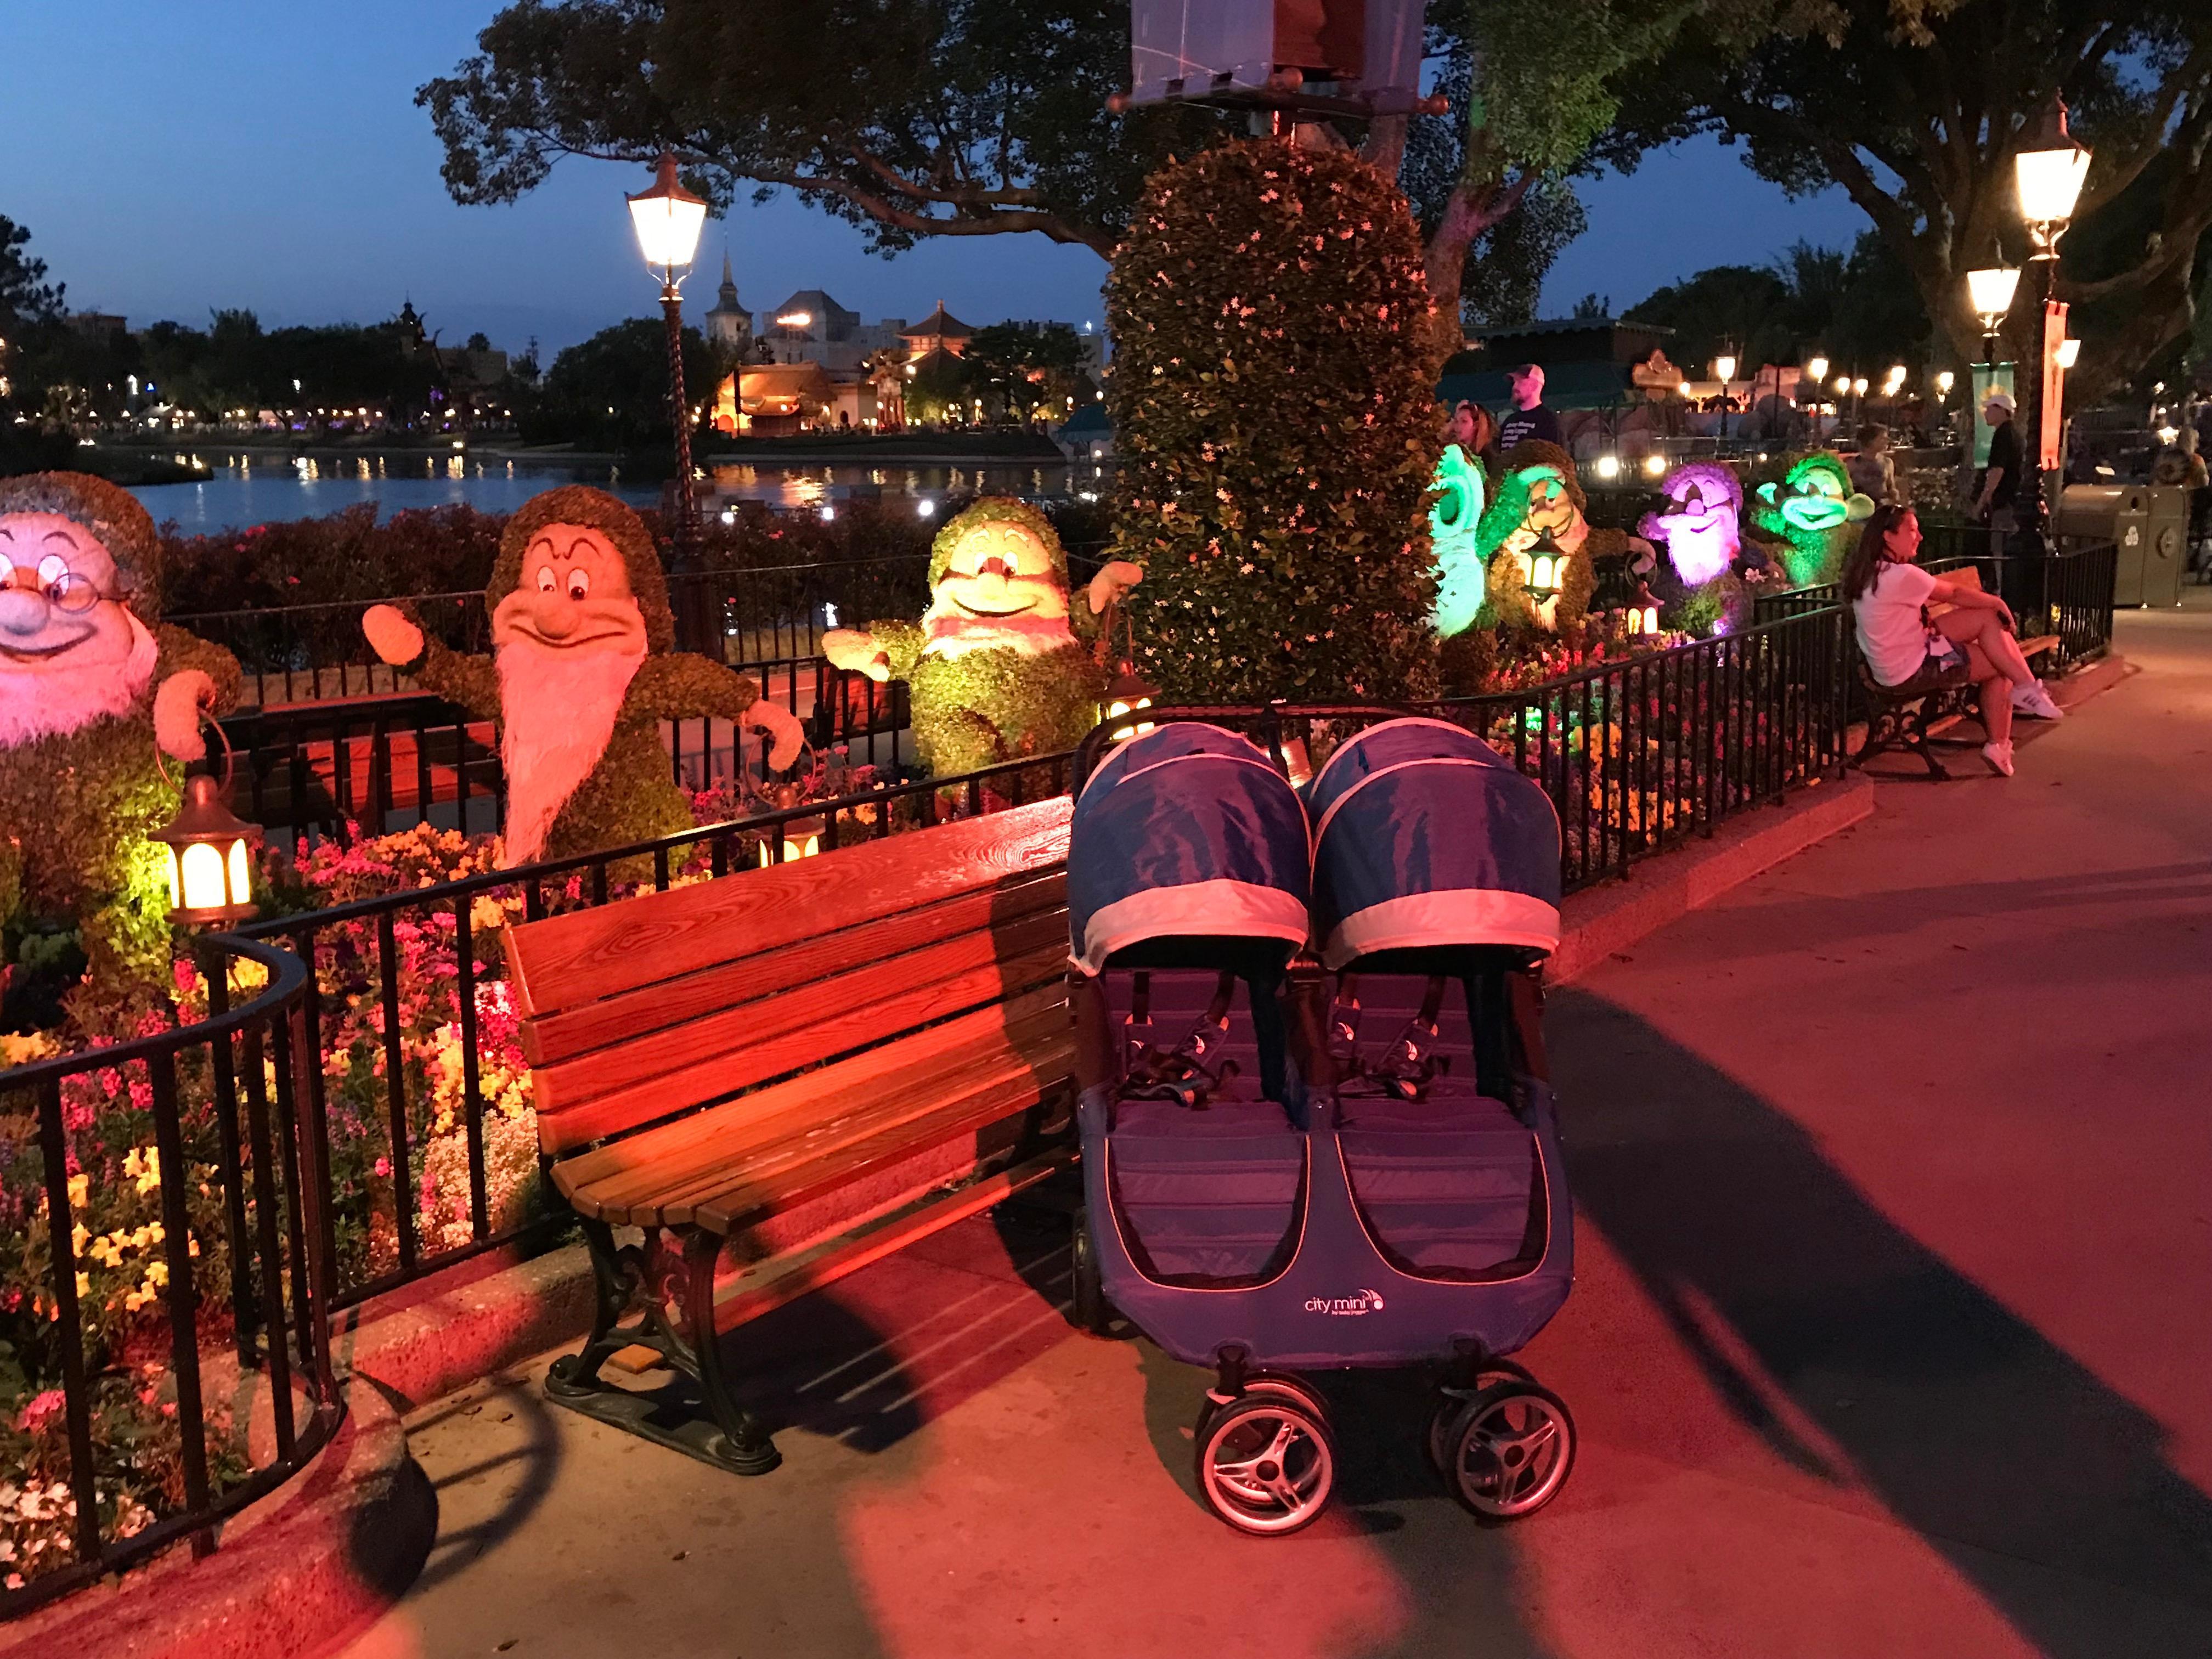 Stroller Rentals Disney image 48